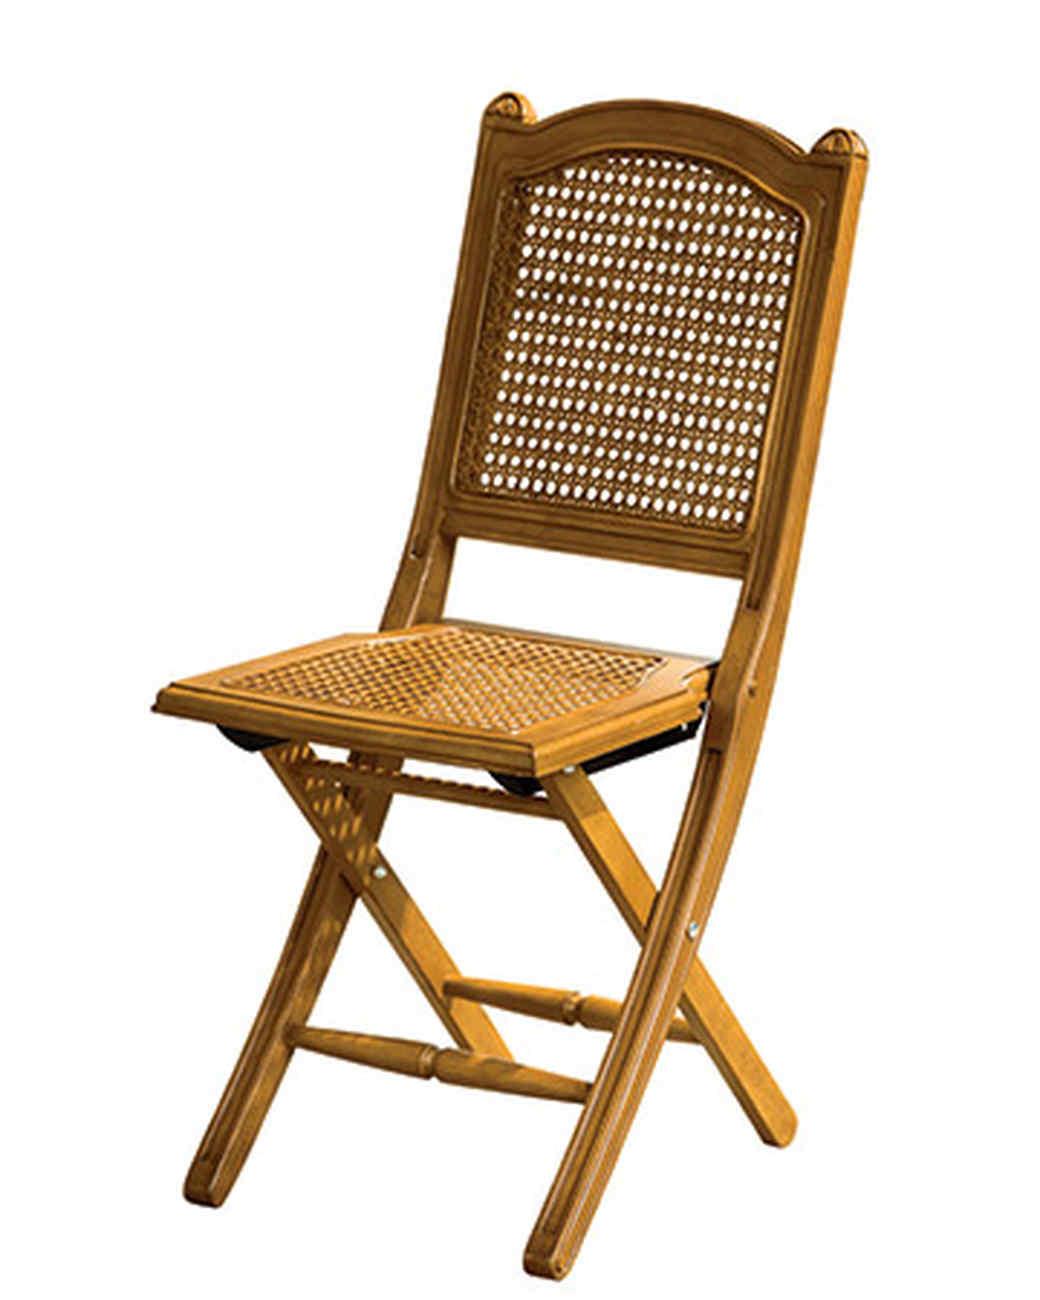 mls106521_1110_louis_folding_chair.jpg